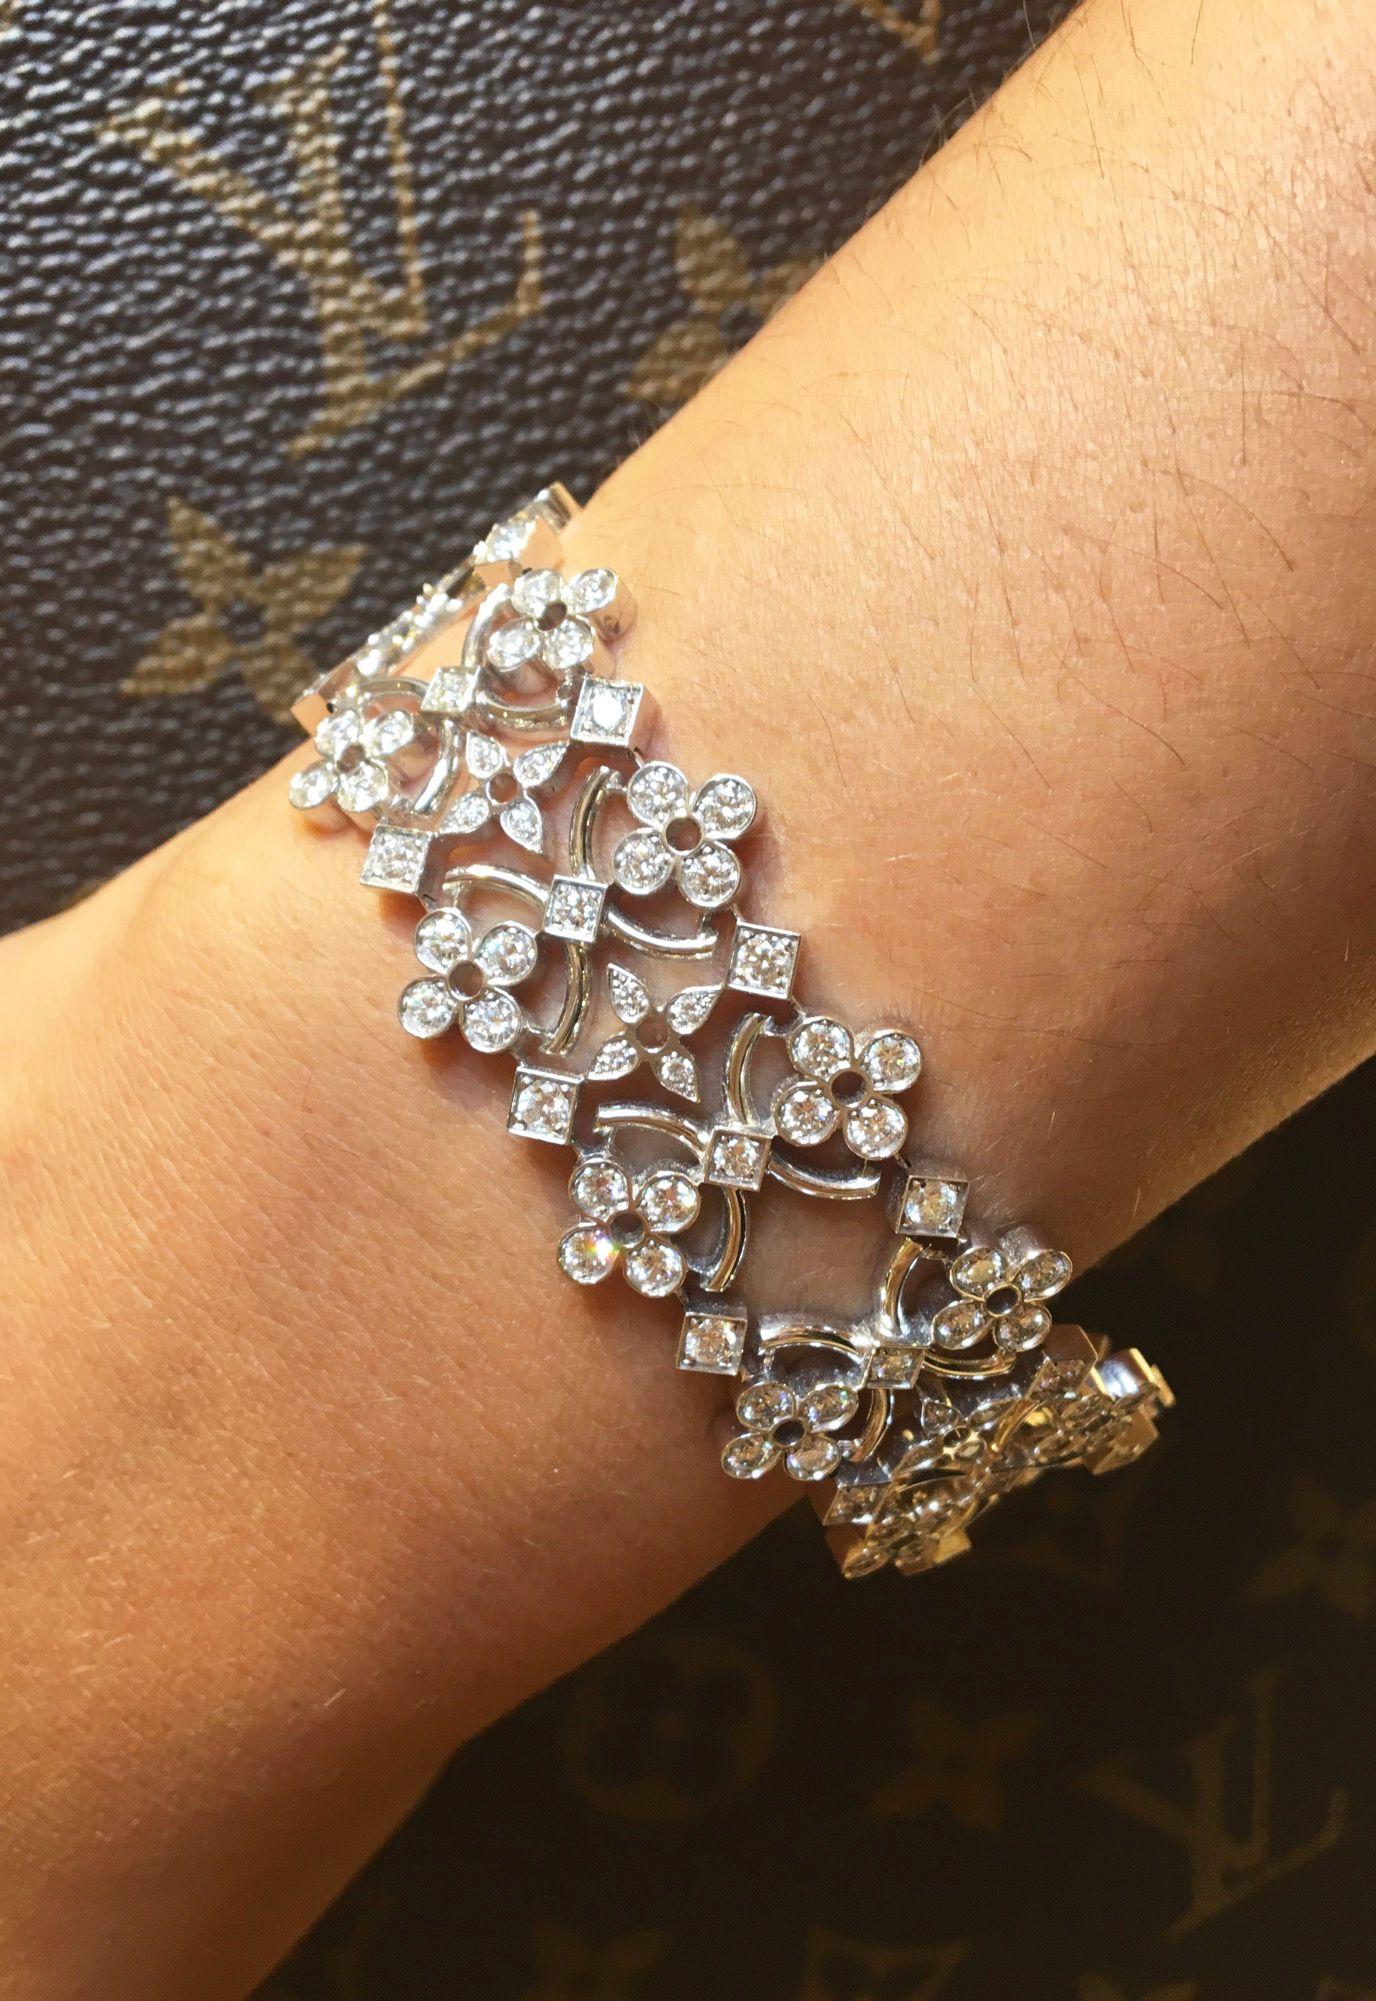 Louis Vuitton Dentelle de Monogram bracelet with diamonds set in white gold to recreate the delicate pattern of lace.